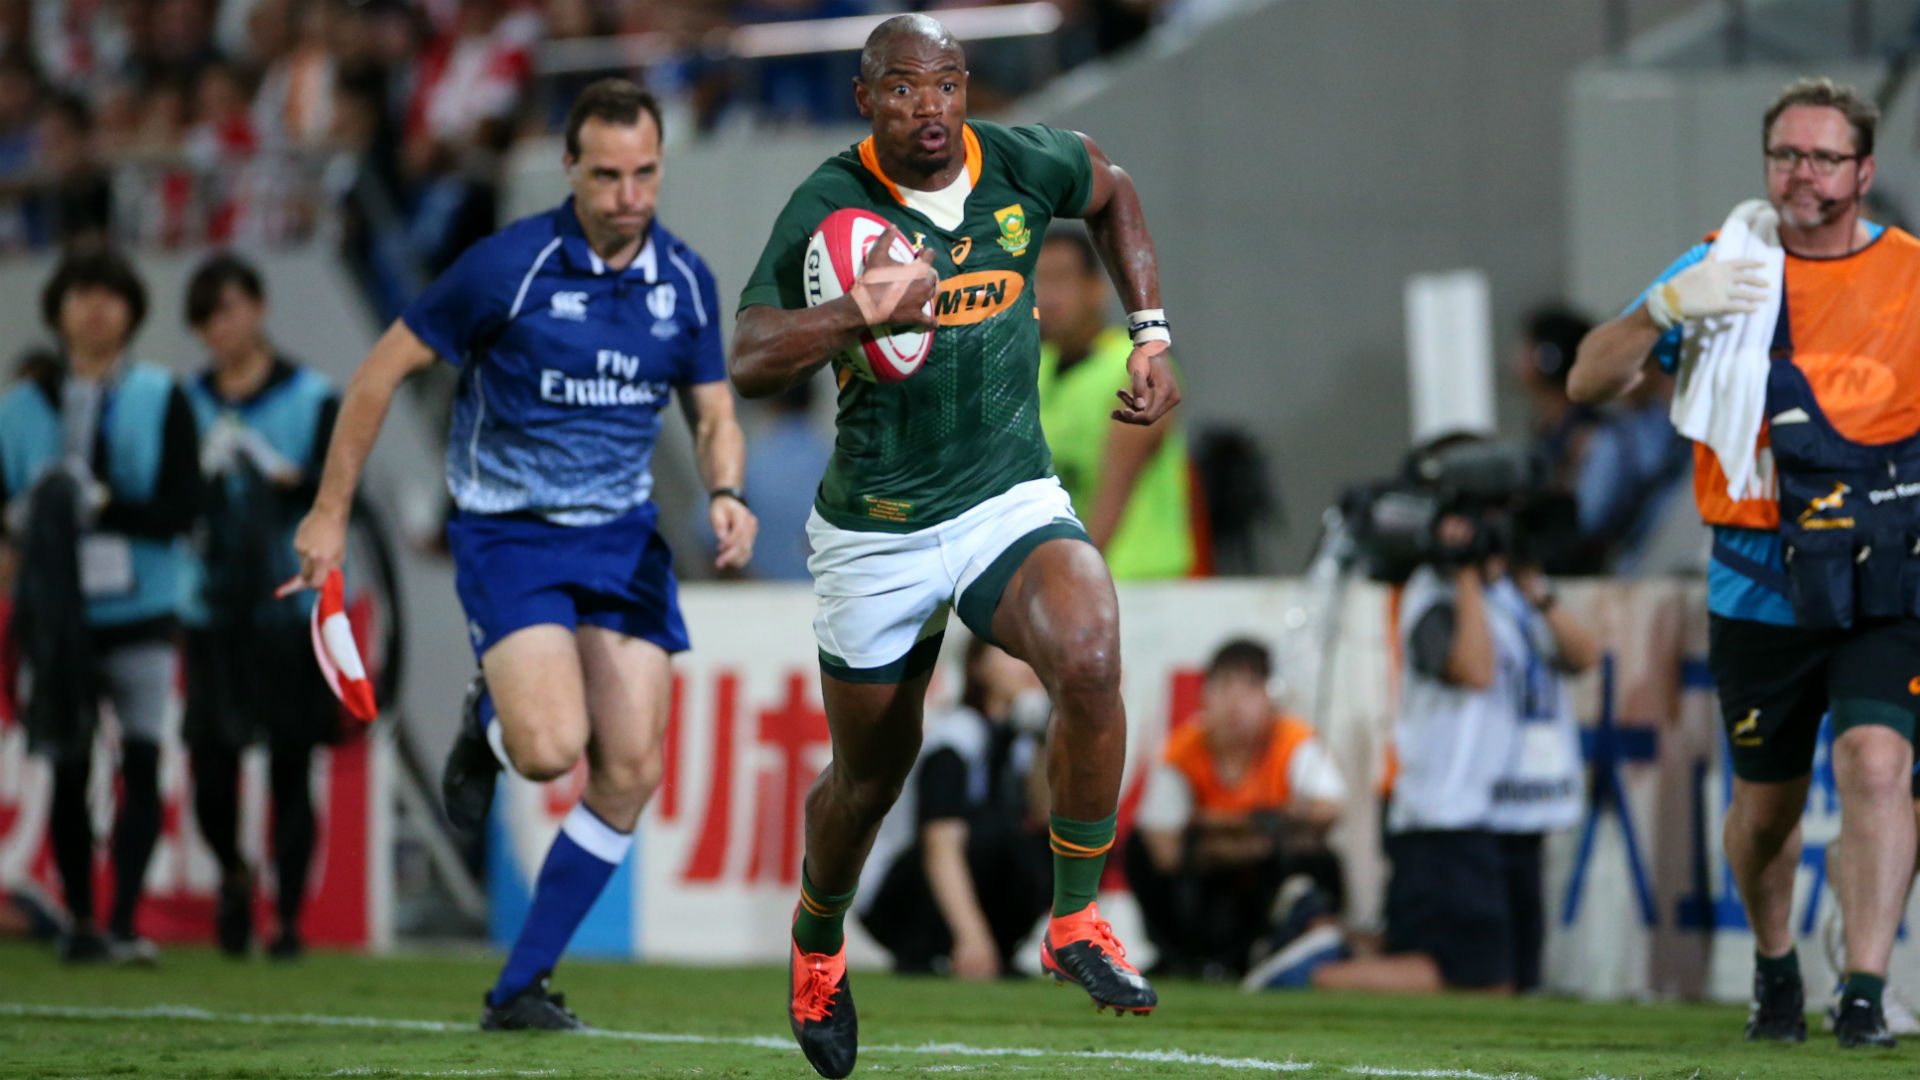 Japan 7 41 South Africa: Makazole Mapimpi scores hat trick as